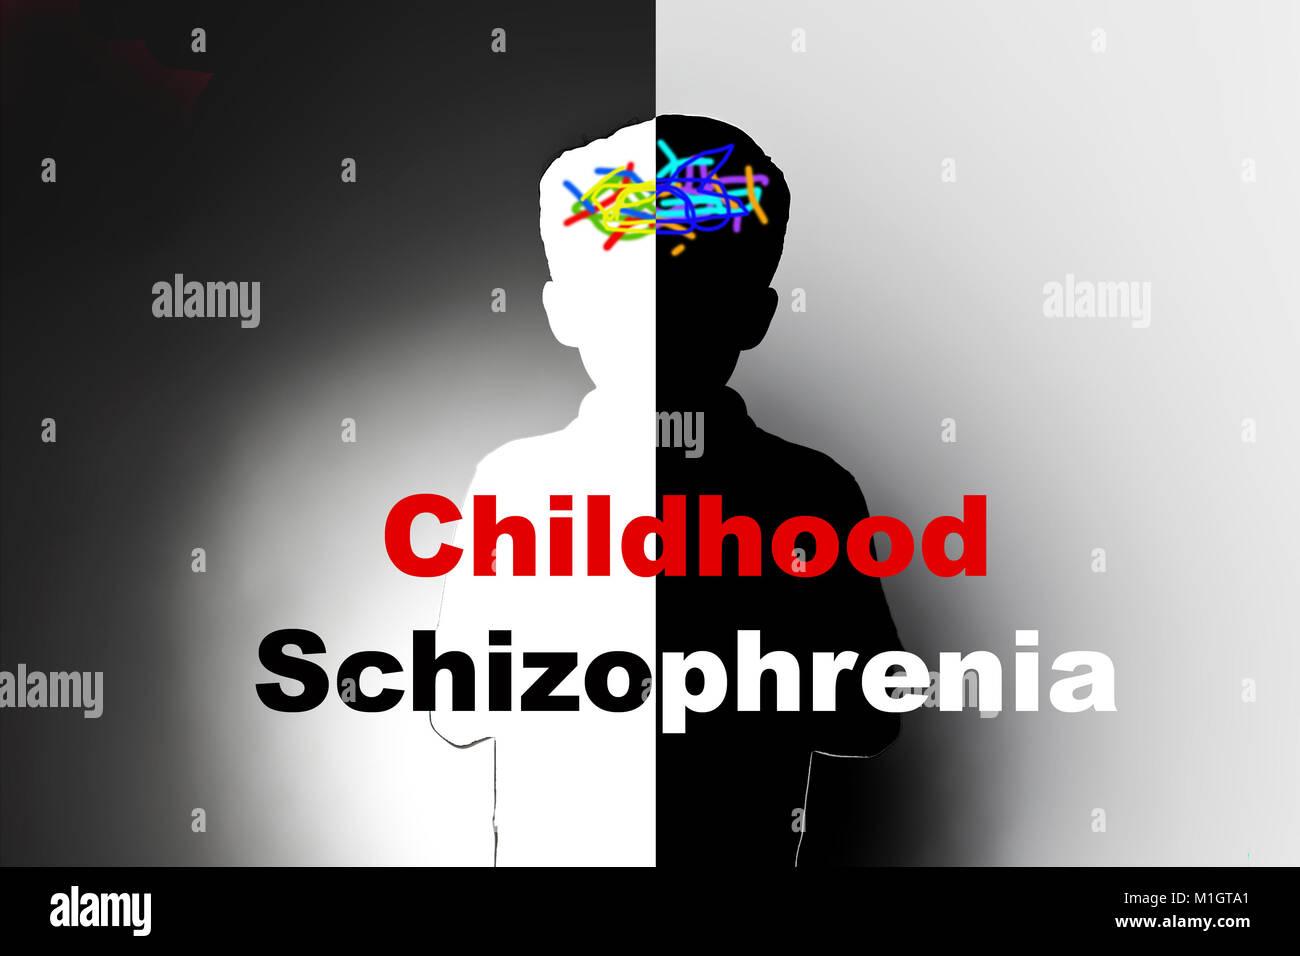 childhood schizophrenia, safeguarding children and social care, mental illness - Stock Image